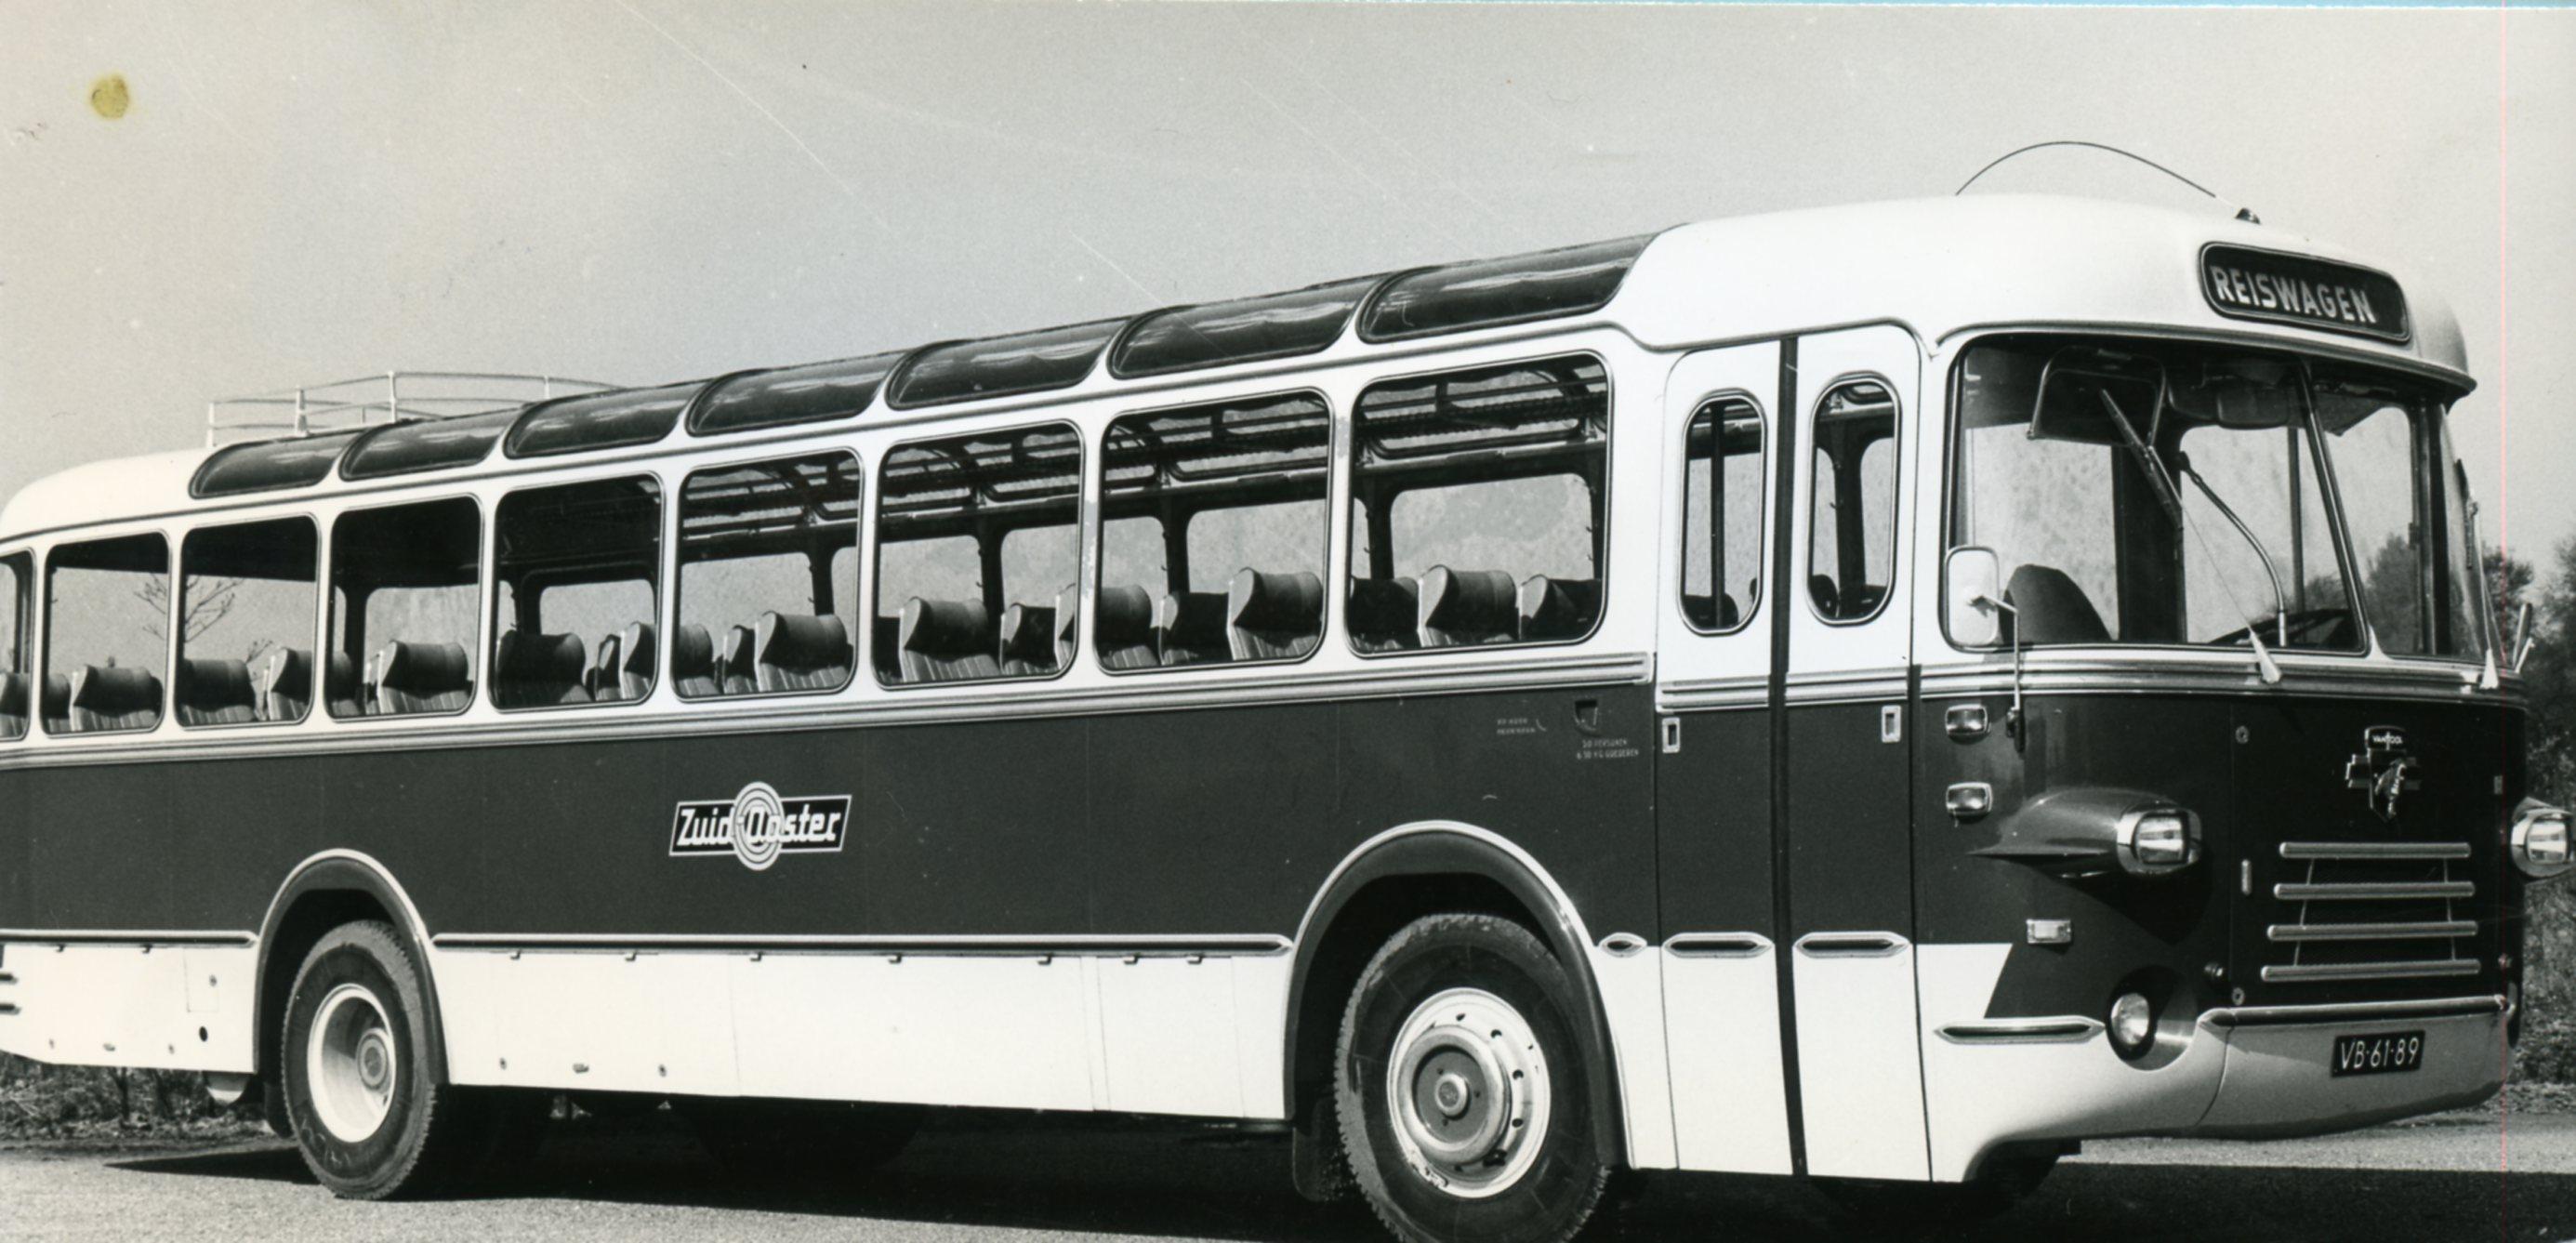 7335-VB6189-1963